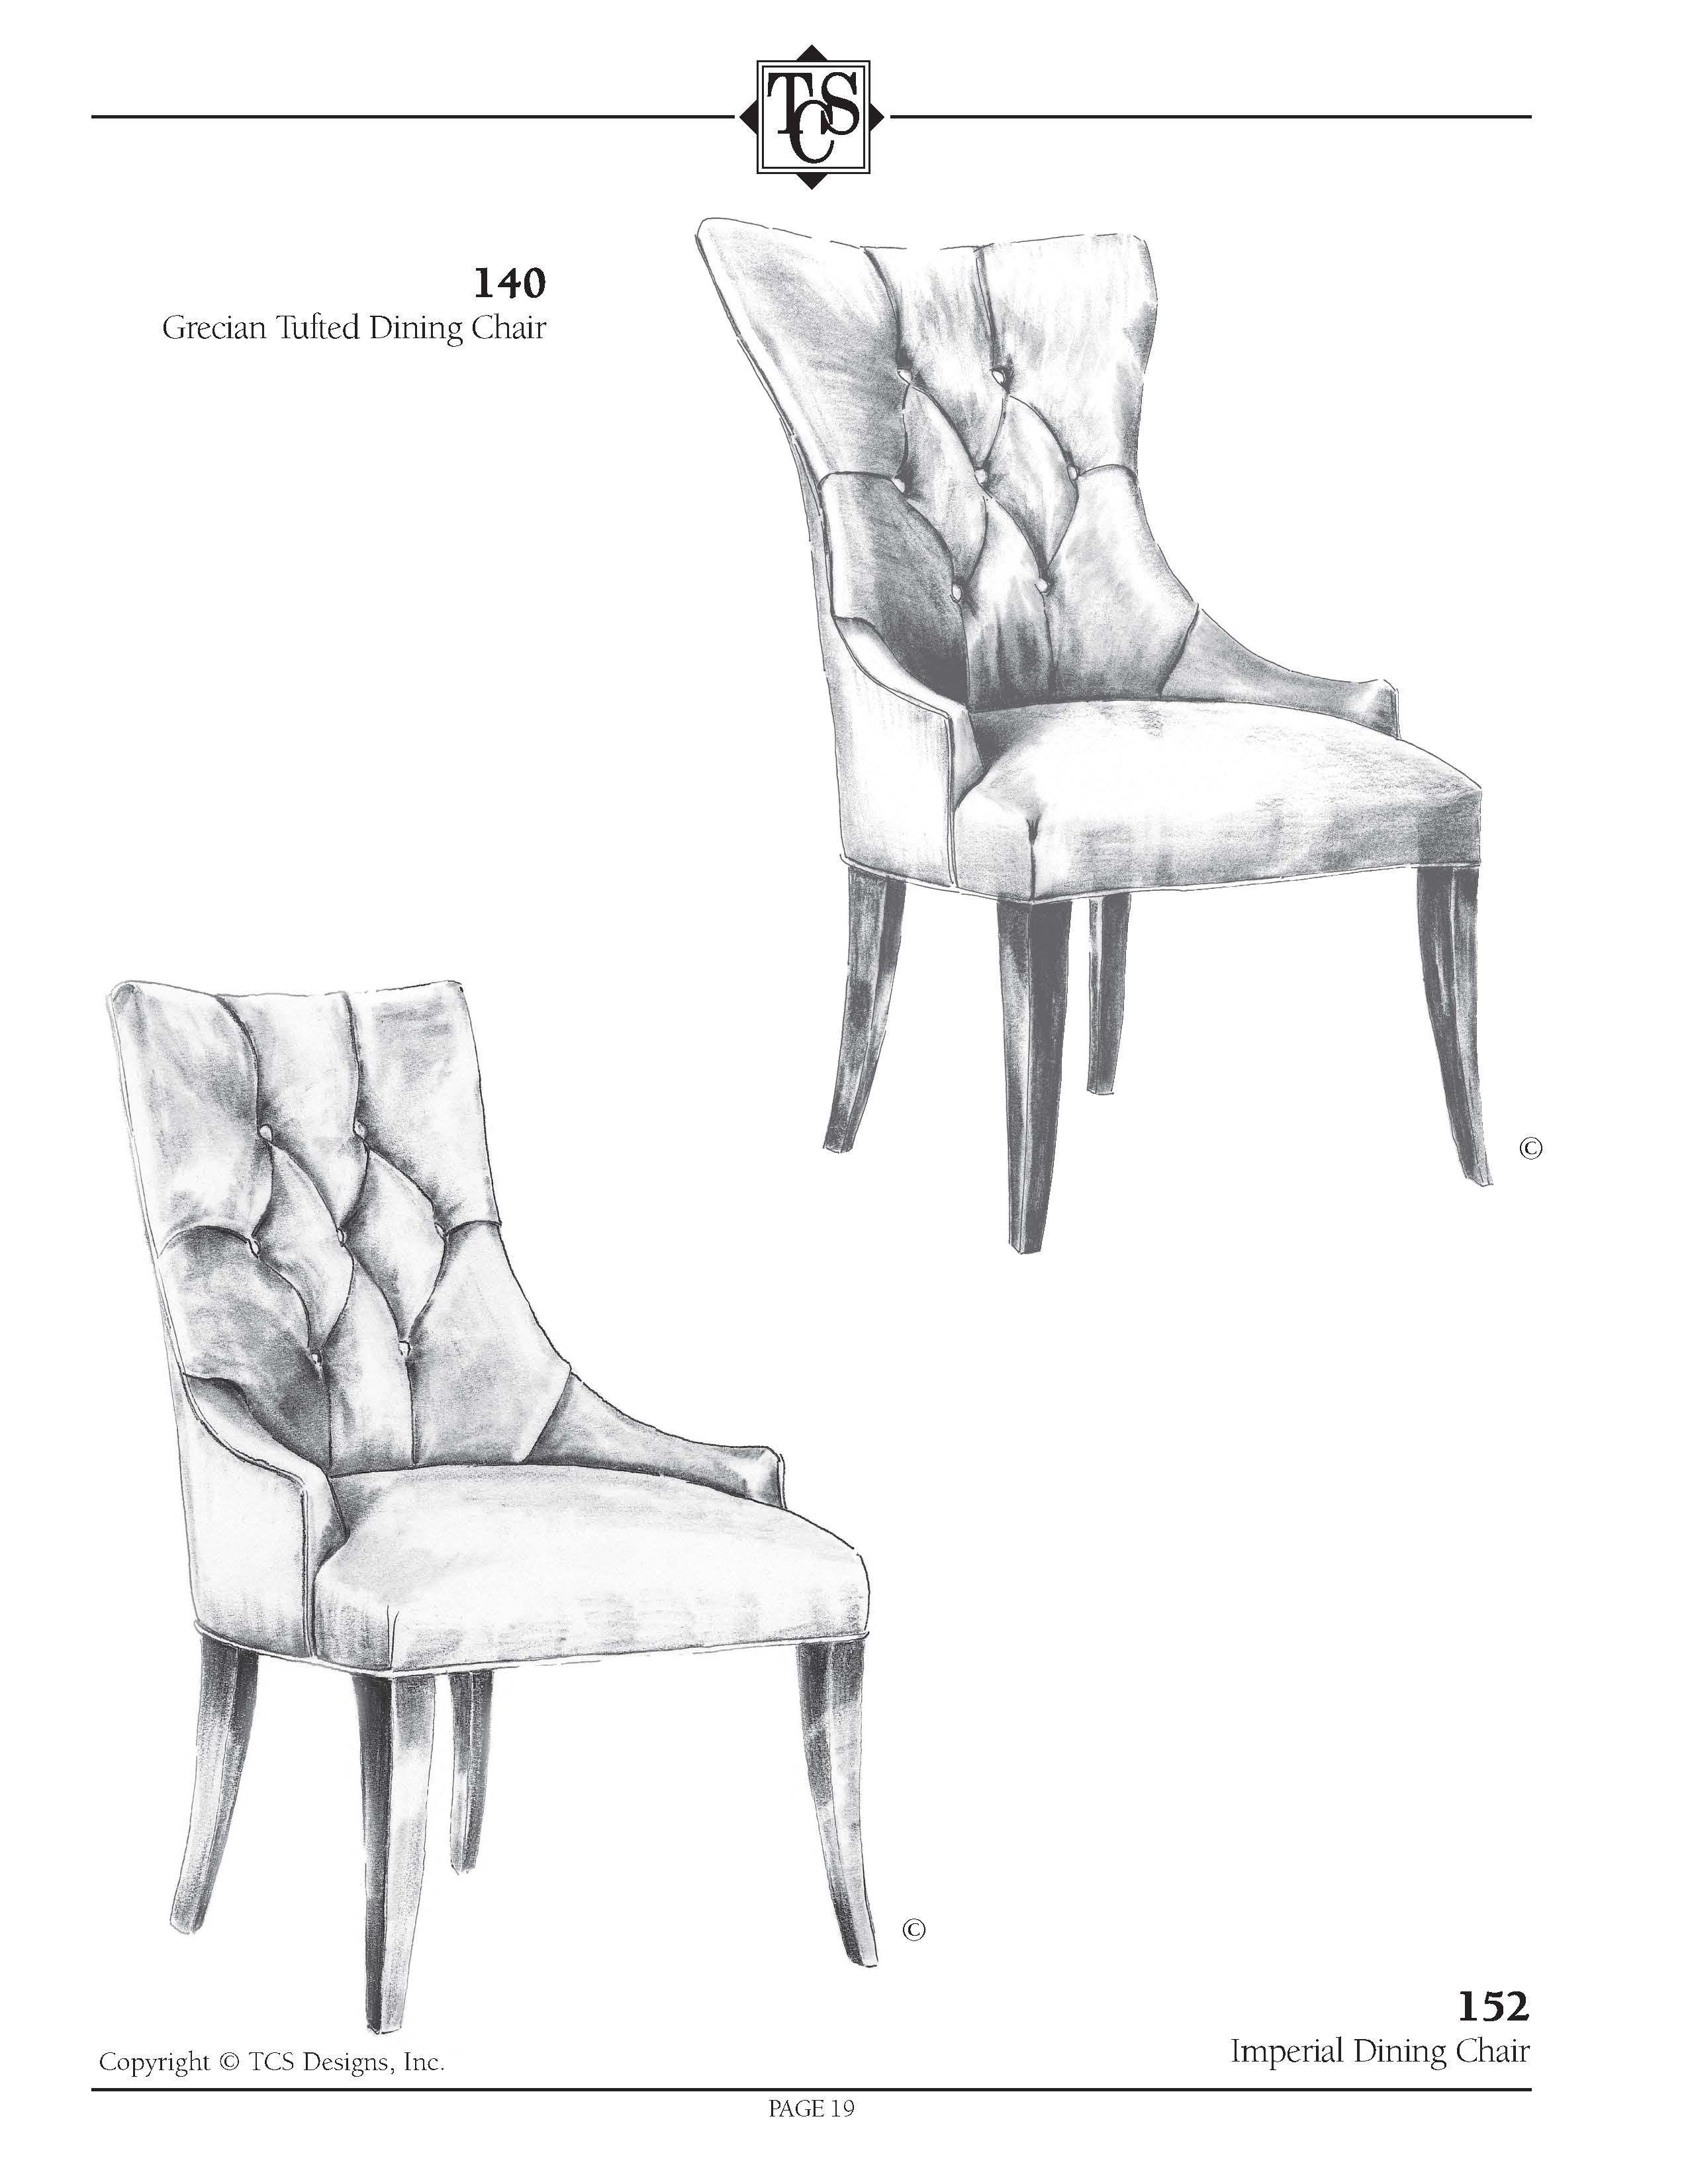 TCS - 140 Grecian Tufted Dining Chair 24w x 29d x 41h, $375 net. 152 ...